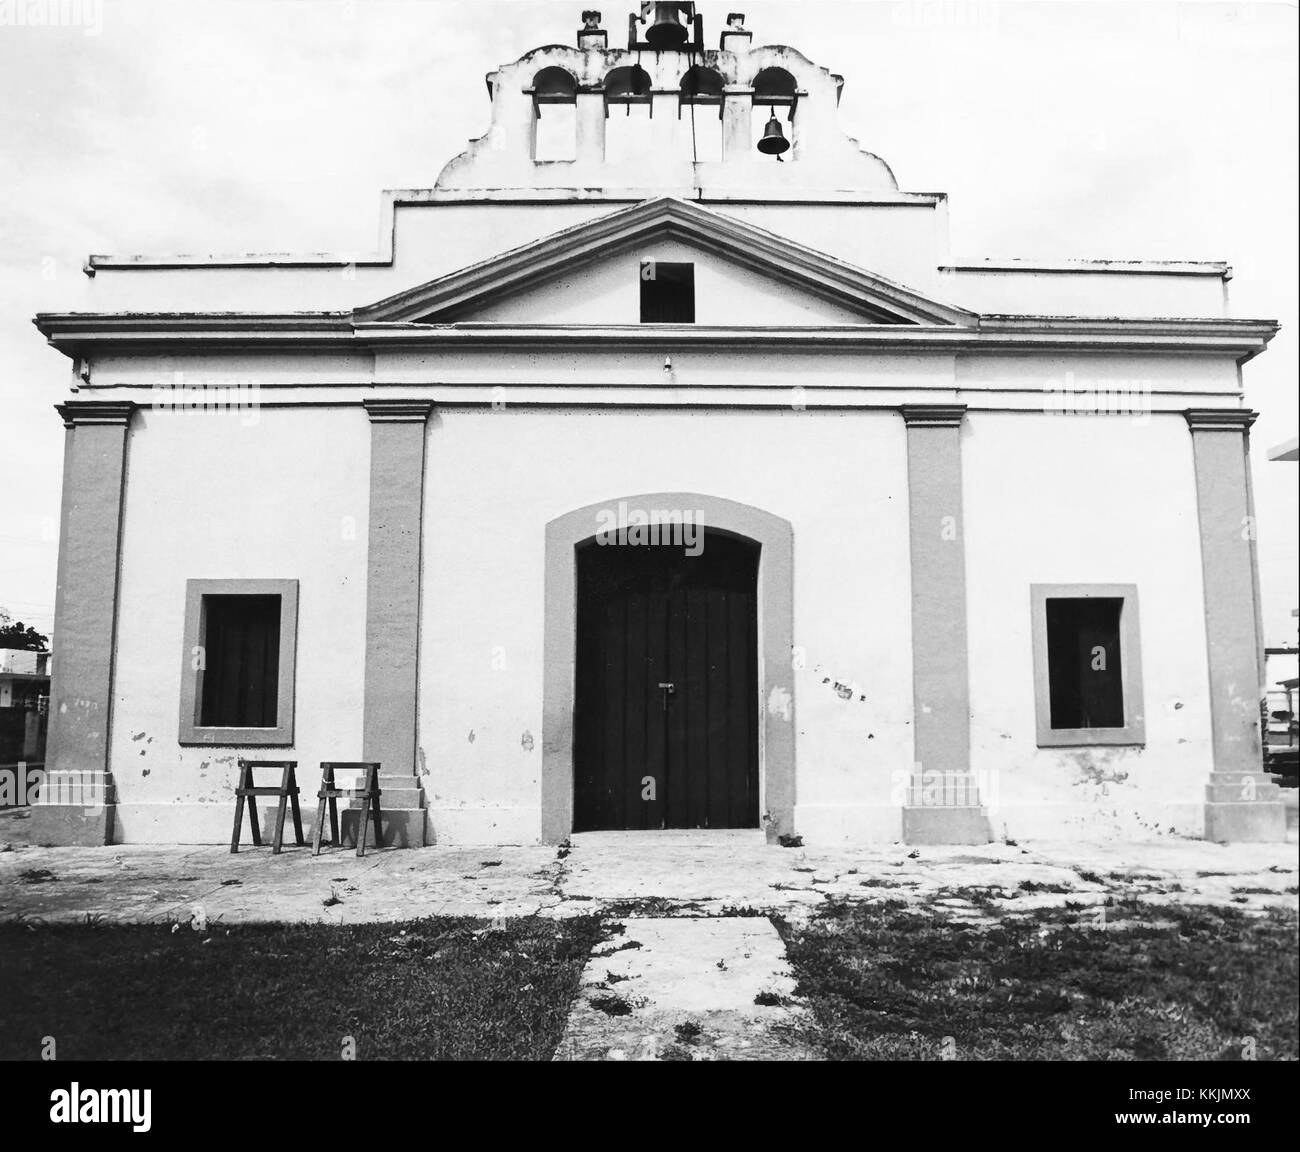 Iglesia Parroquial de San Pedro Apostol de Toa Baja - Stock Image